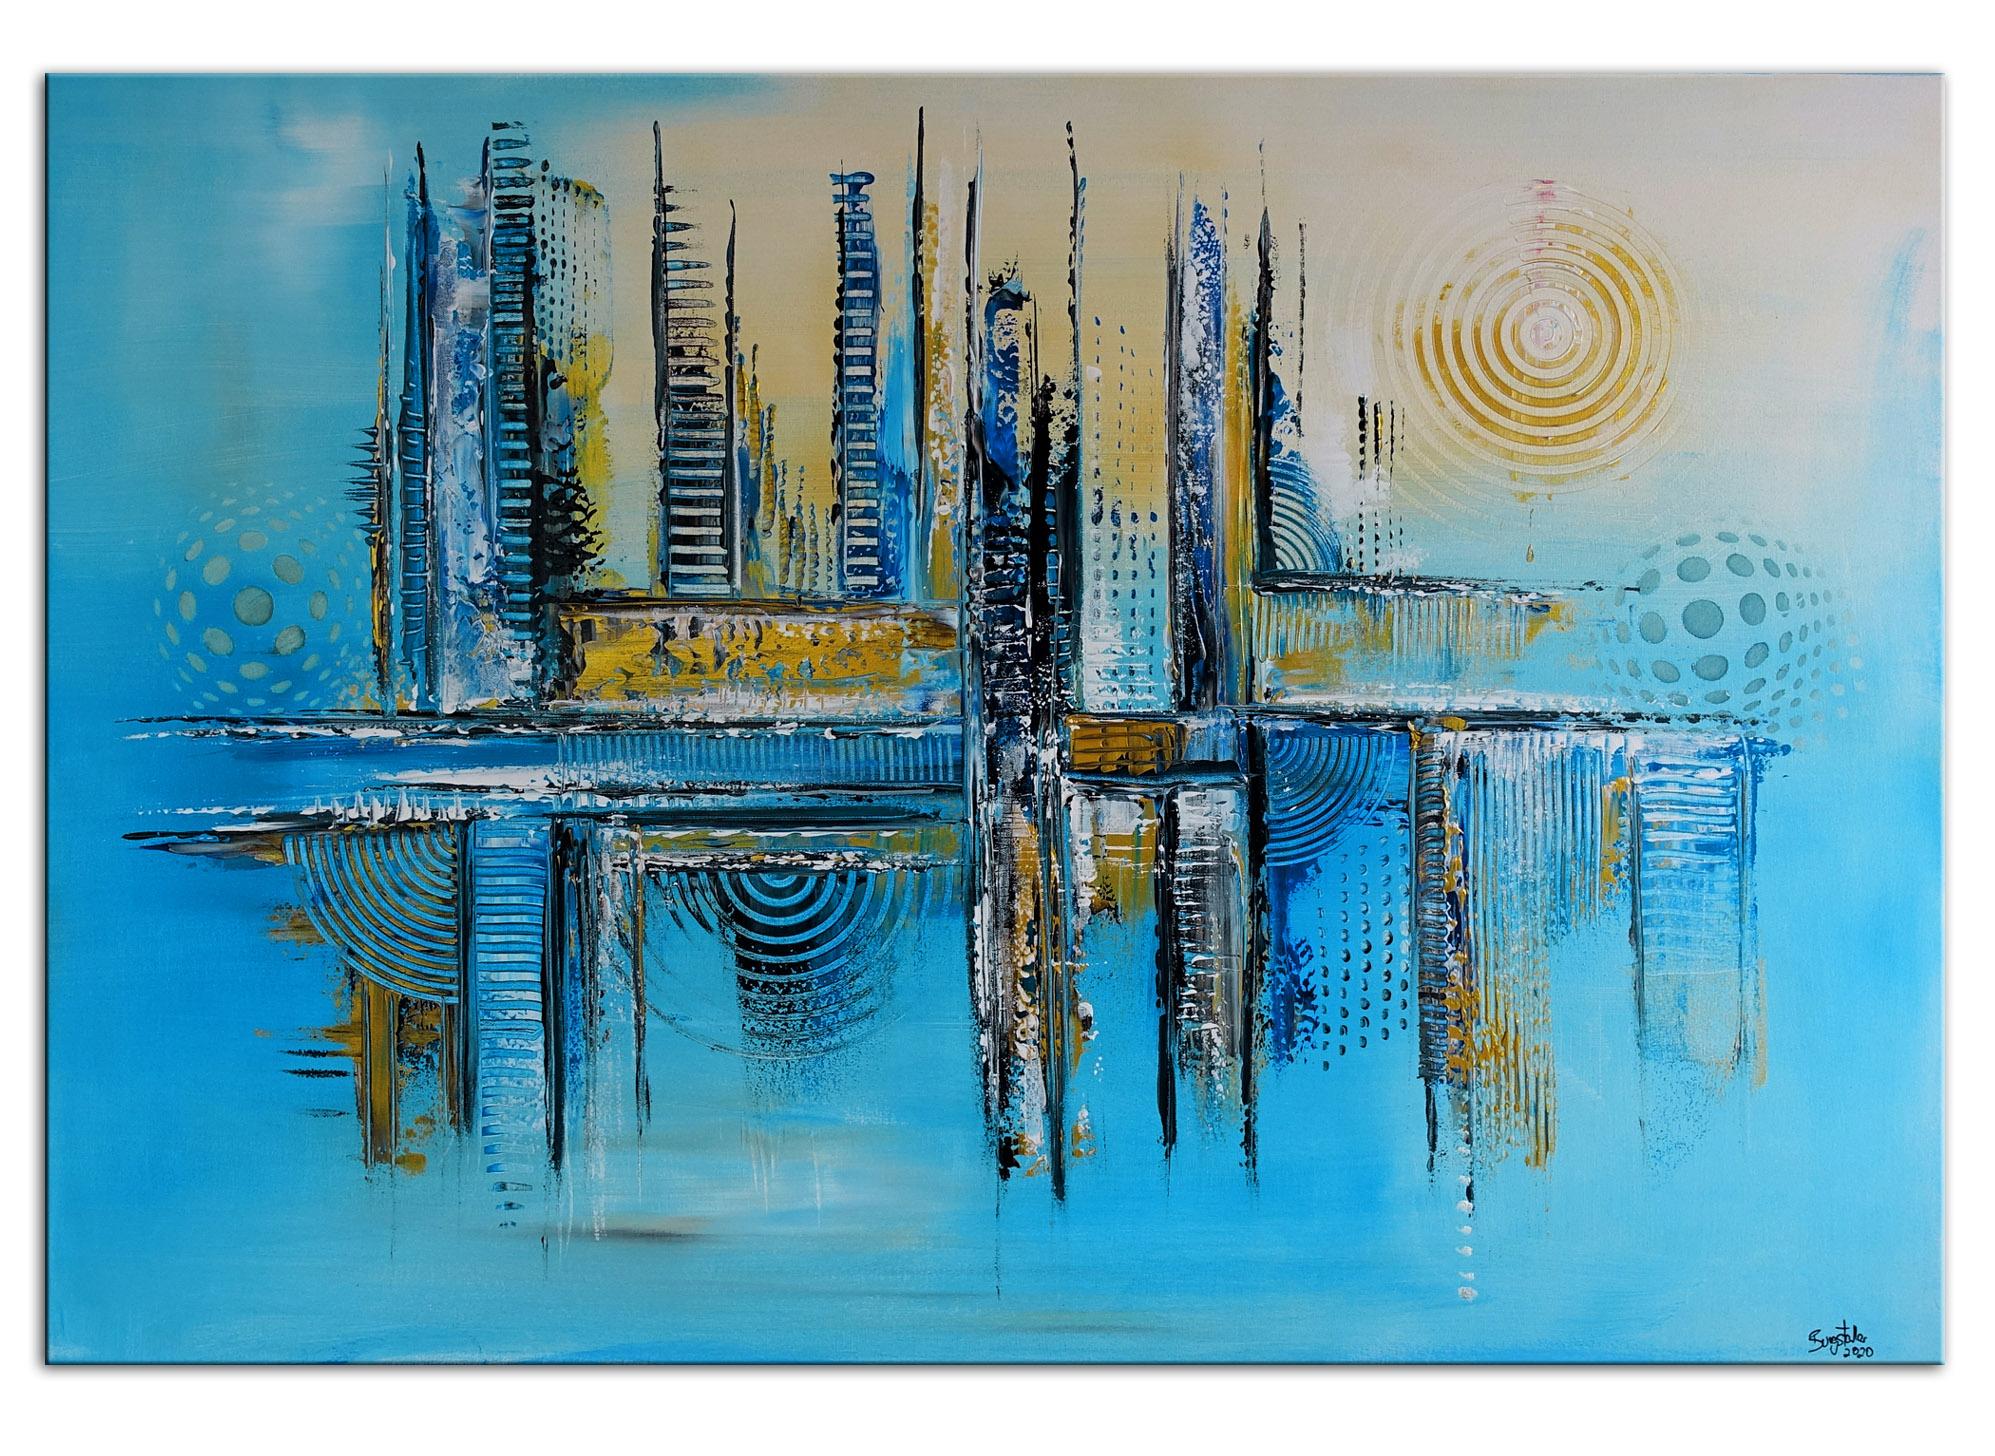 Reykjavic abstrakte malerei blau grau silber moderne kunst abstract artwork peinture 70x100